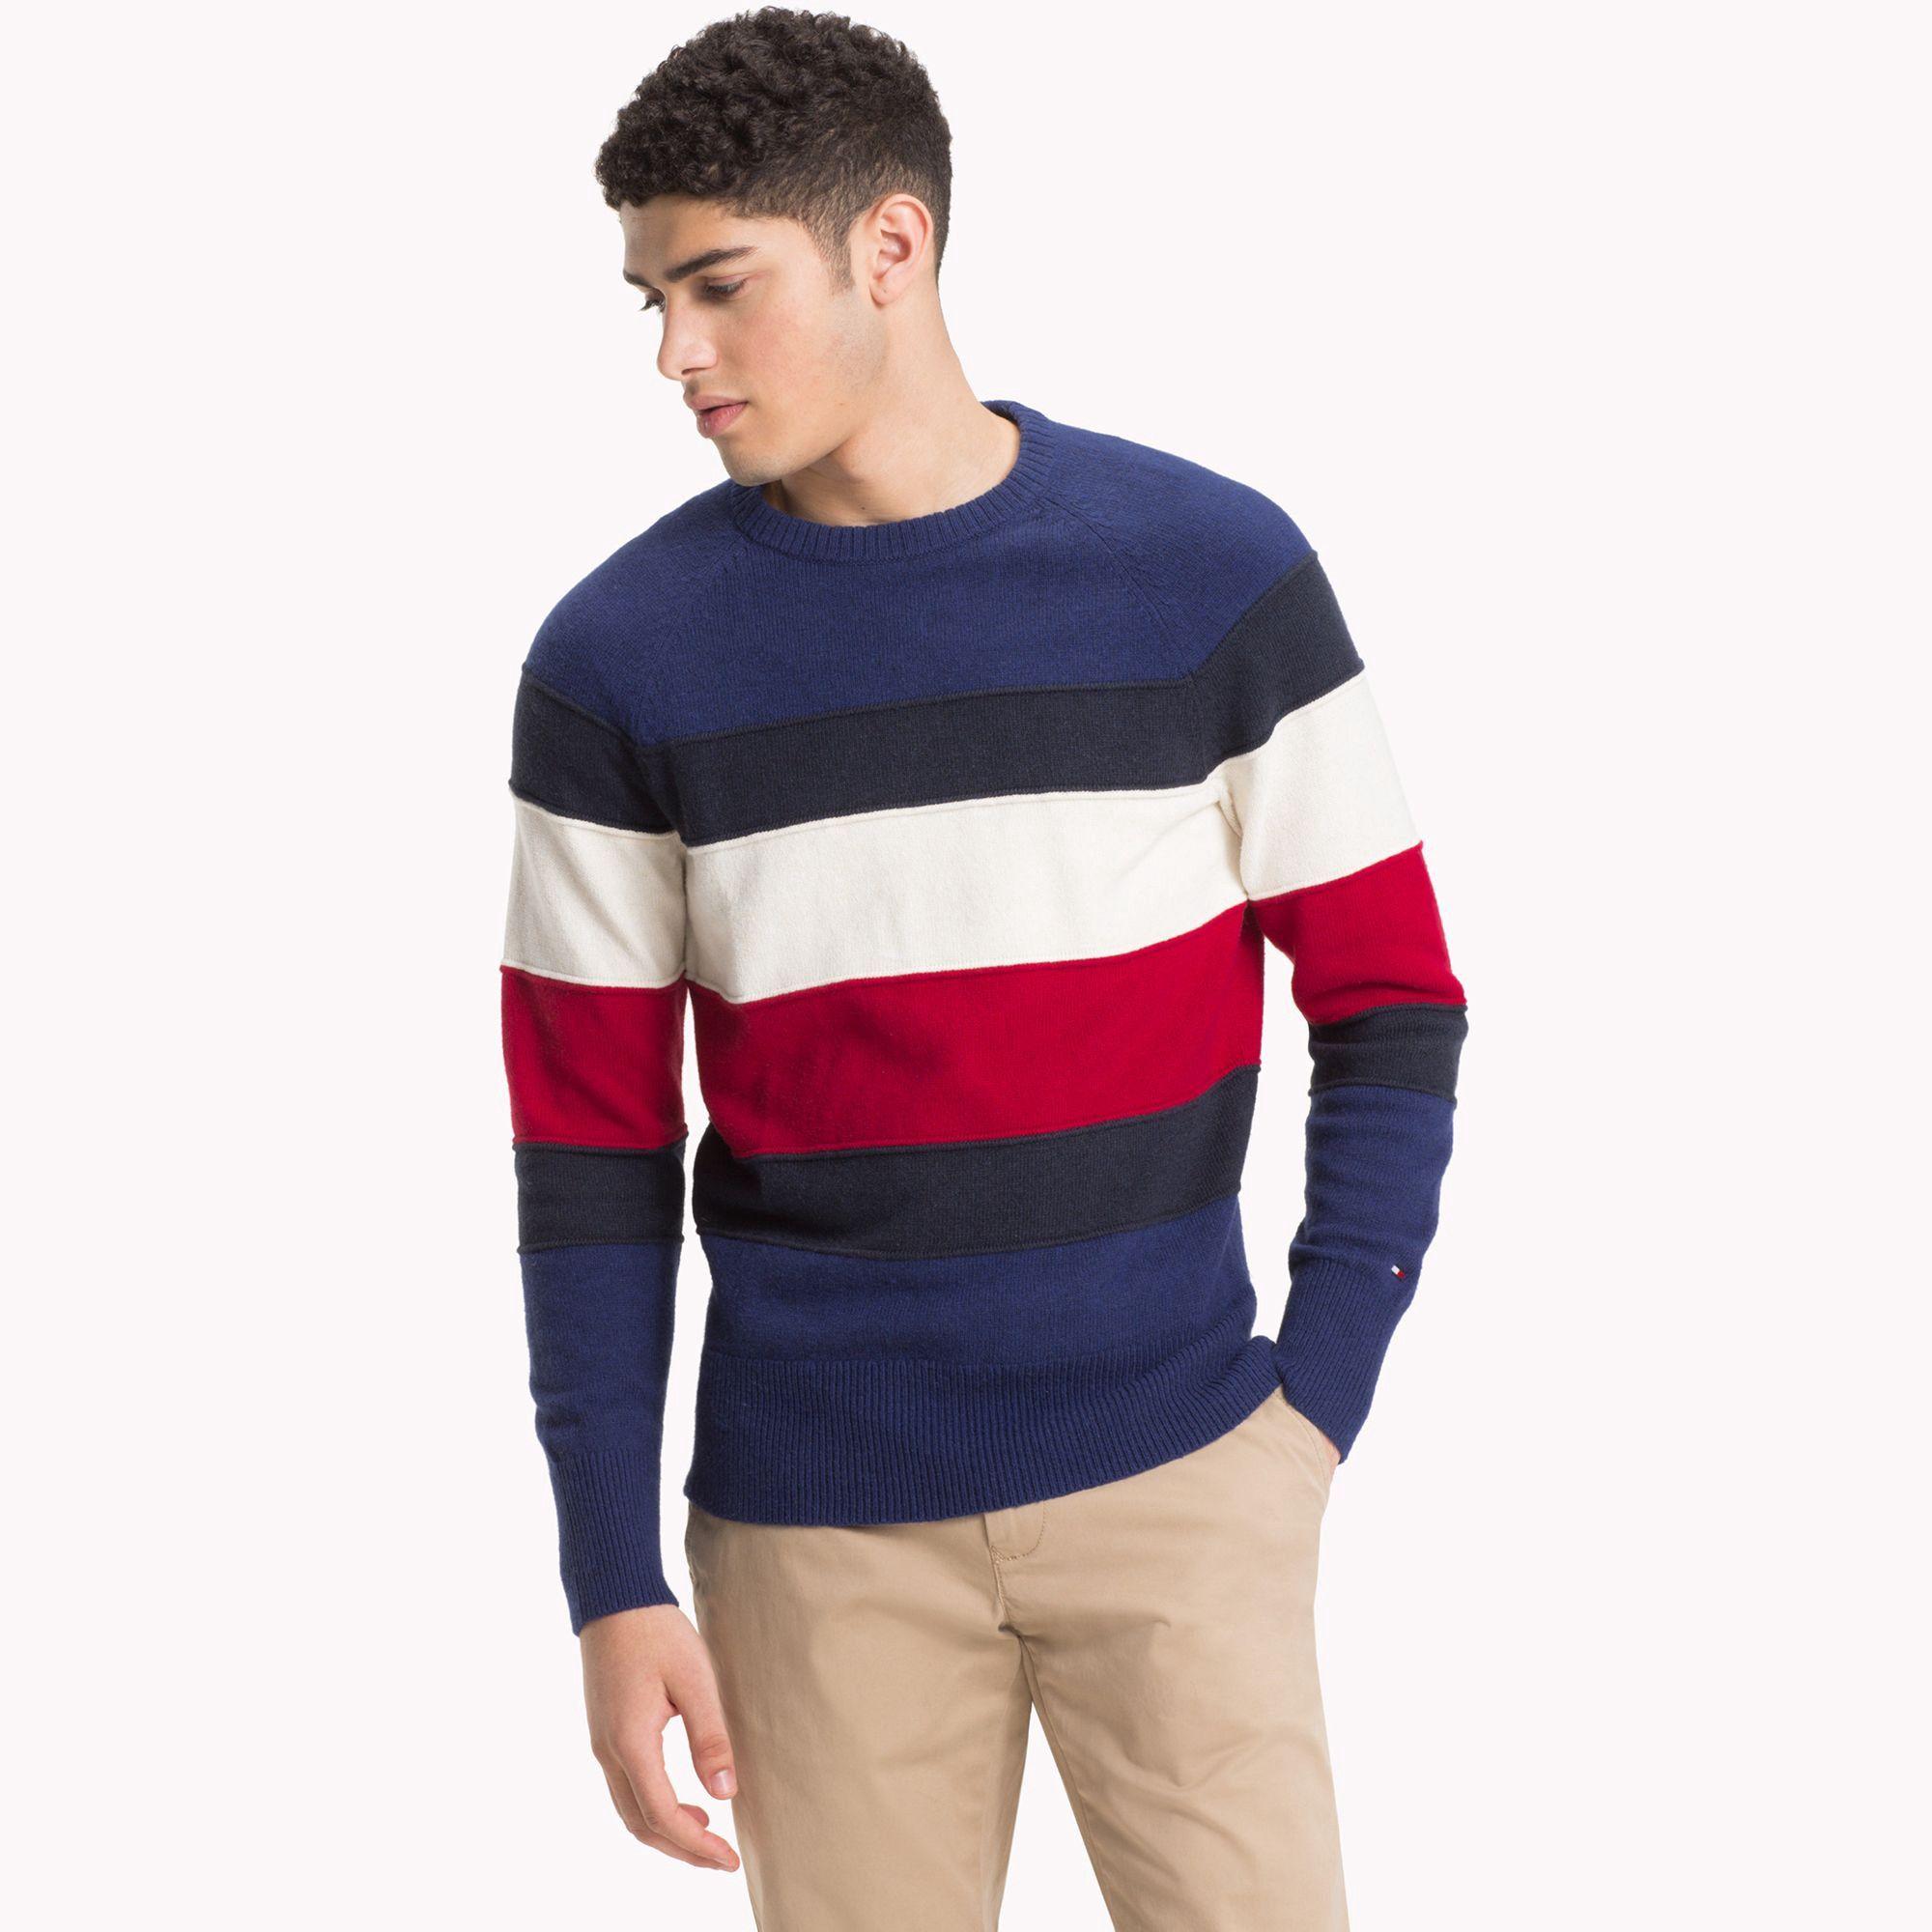 Tommy Hilfiger Colorblock Stripe Sweater Quicksilver Heather L Men Sweater Mens Outfits Men S Waistcoat [ 2000 x 2000 Pixel ]